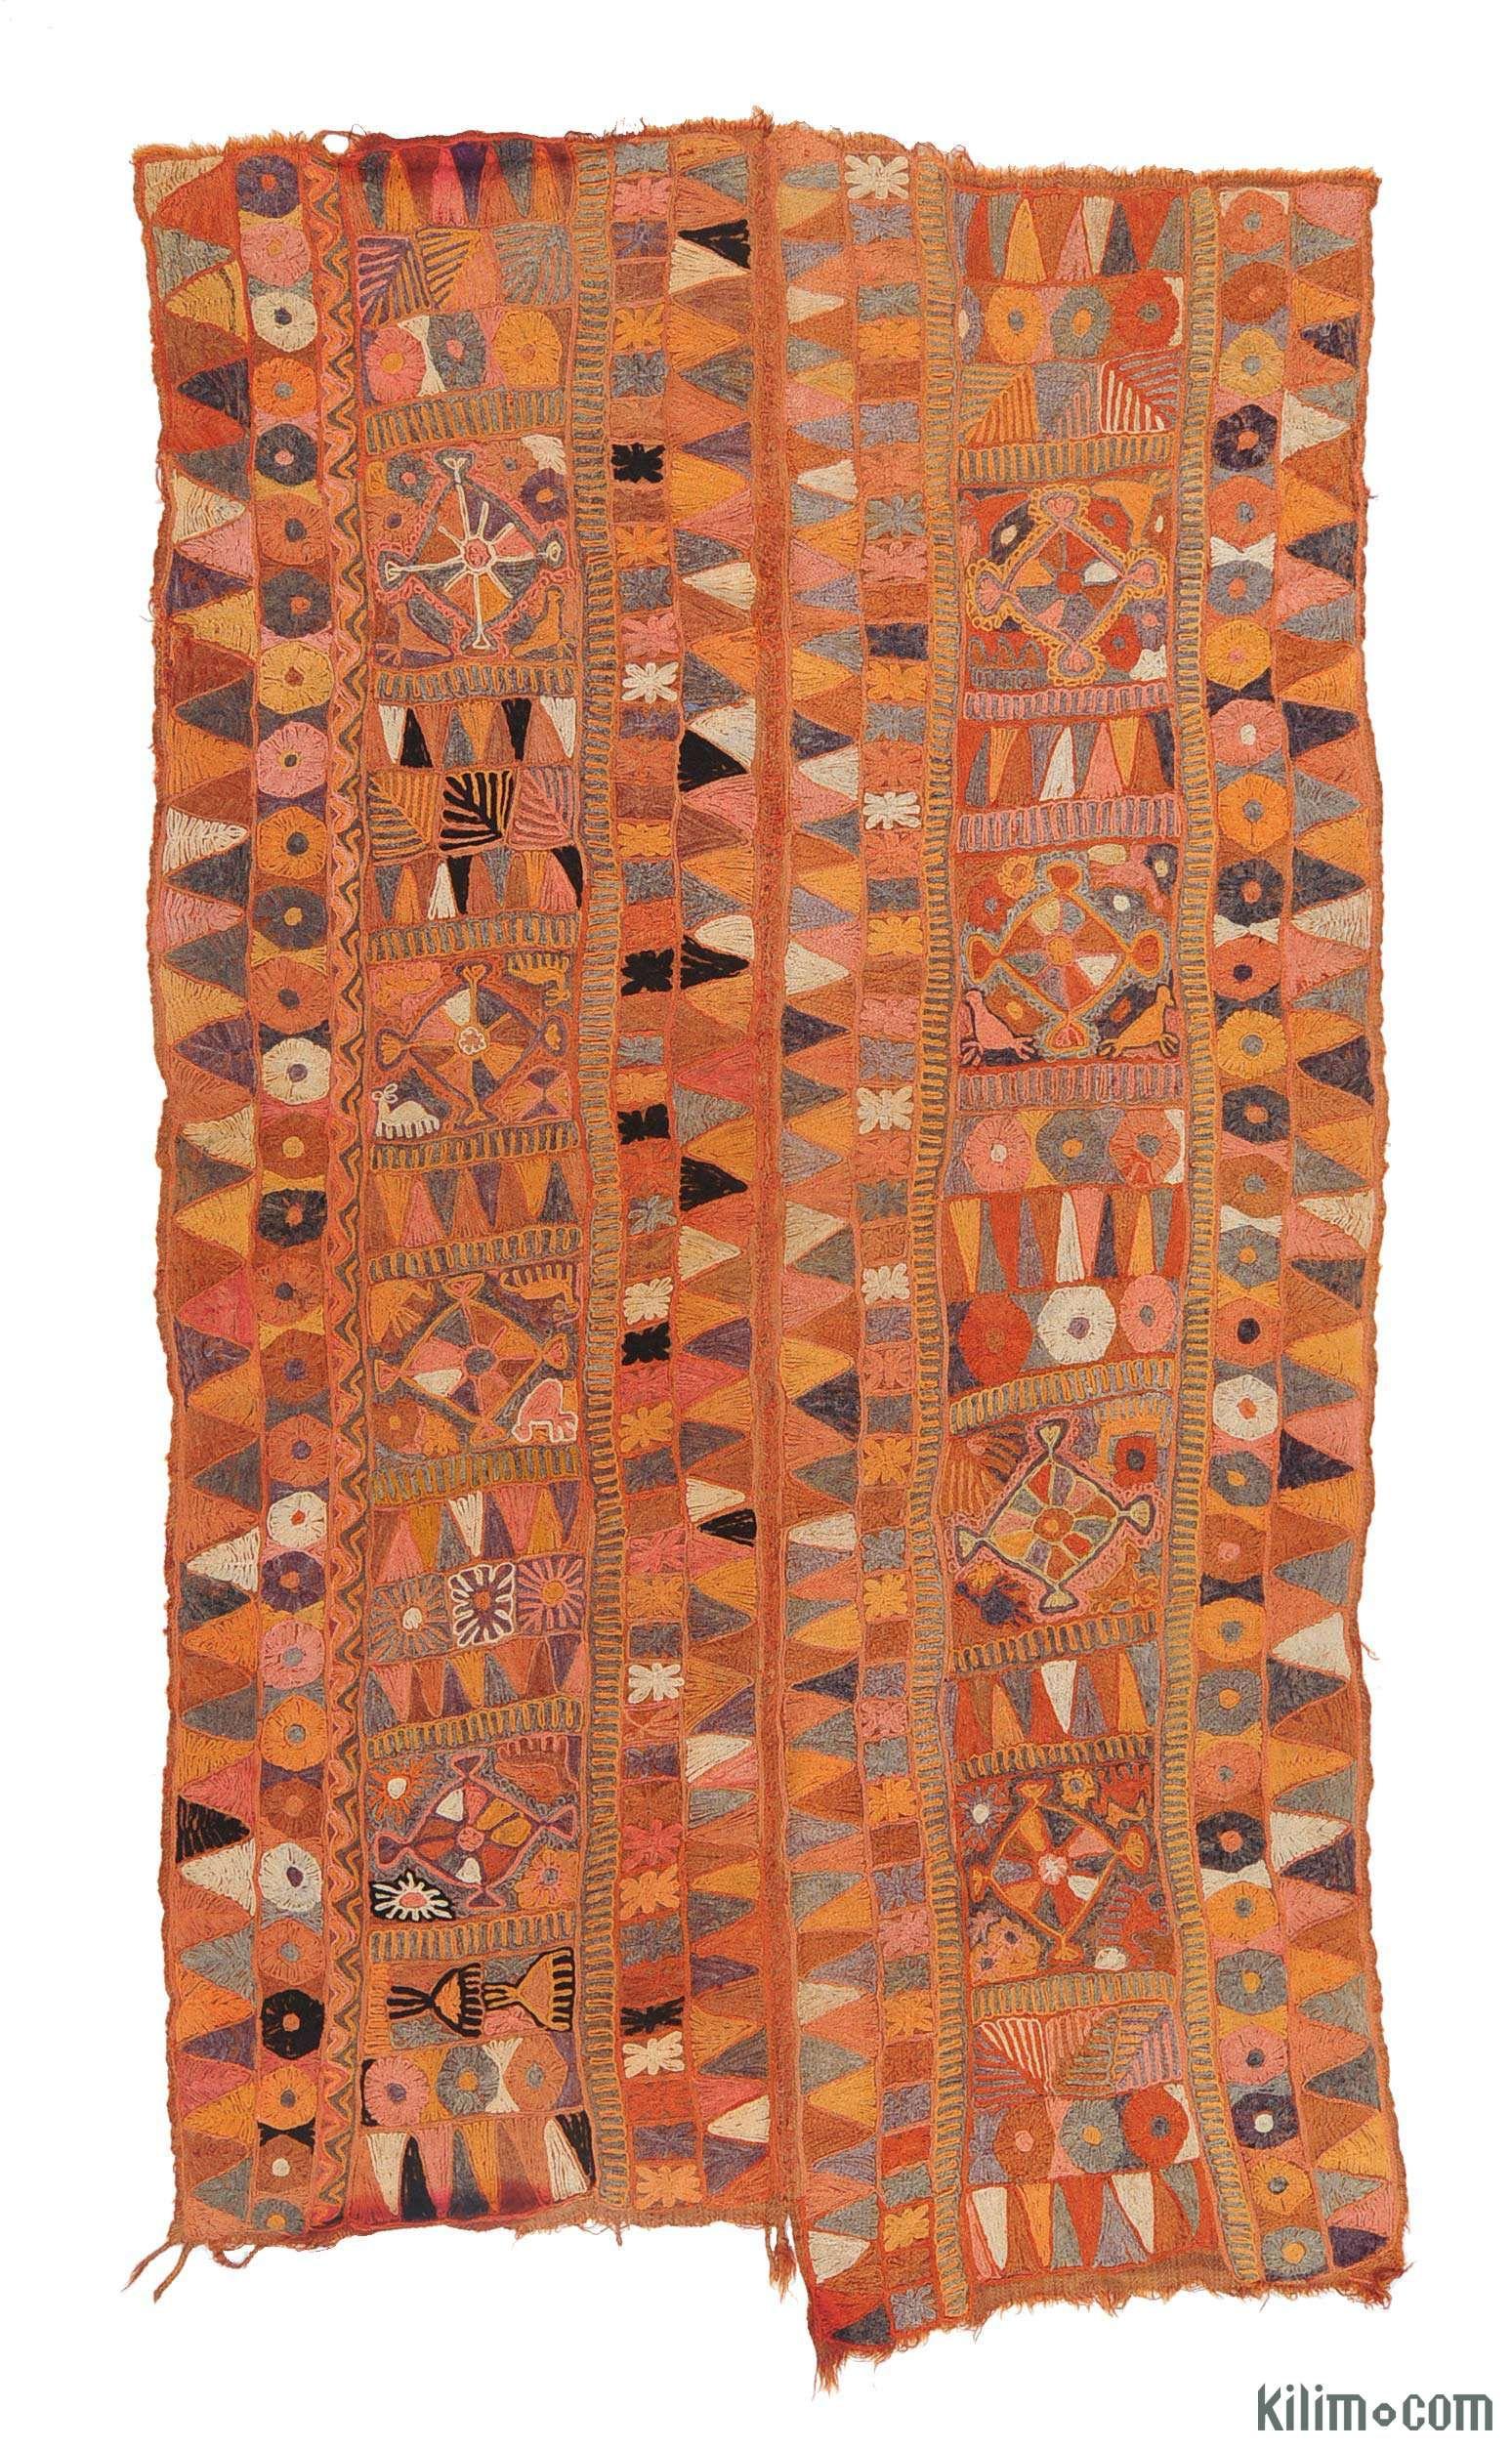 B2b Wholesale Designers Retailers Overdyed Vintage Rugs Kilim Rugs Vintage Rugs